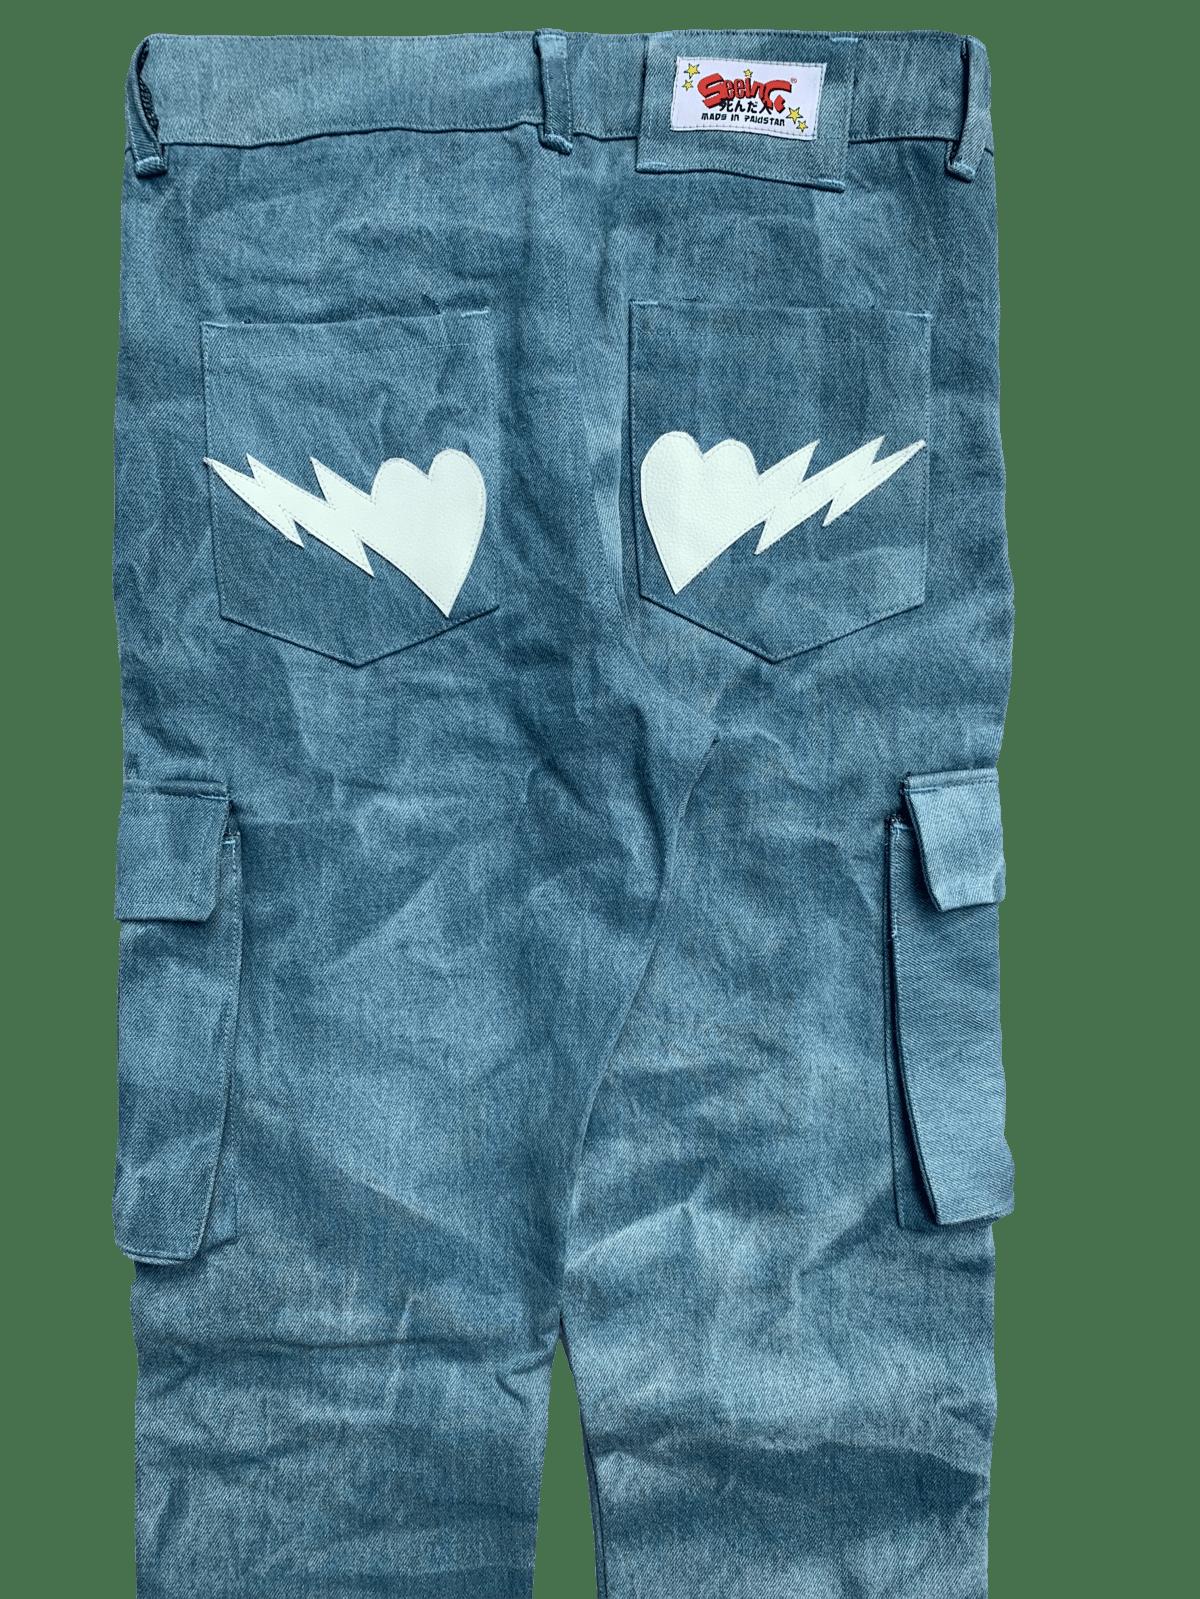 Image of VINTAGE MEDIUM BLUE SUPER SKINNY BONES CARGO JEANS